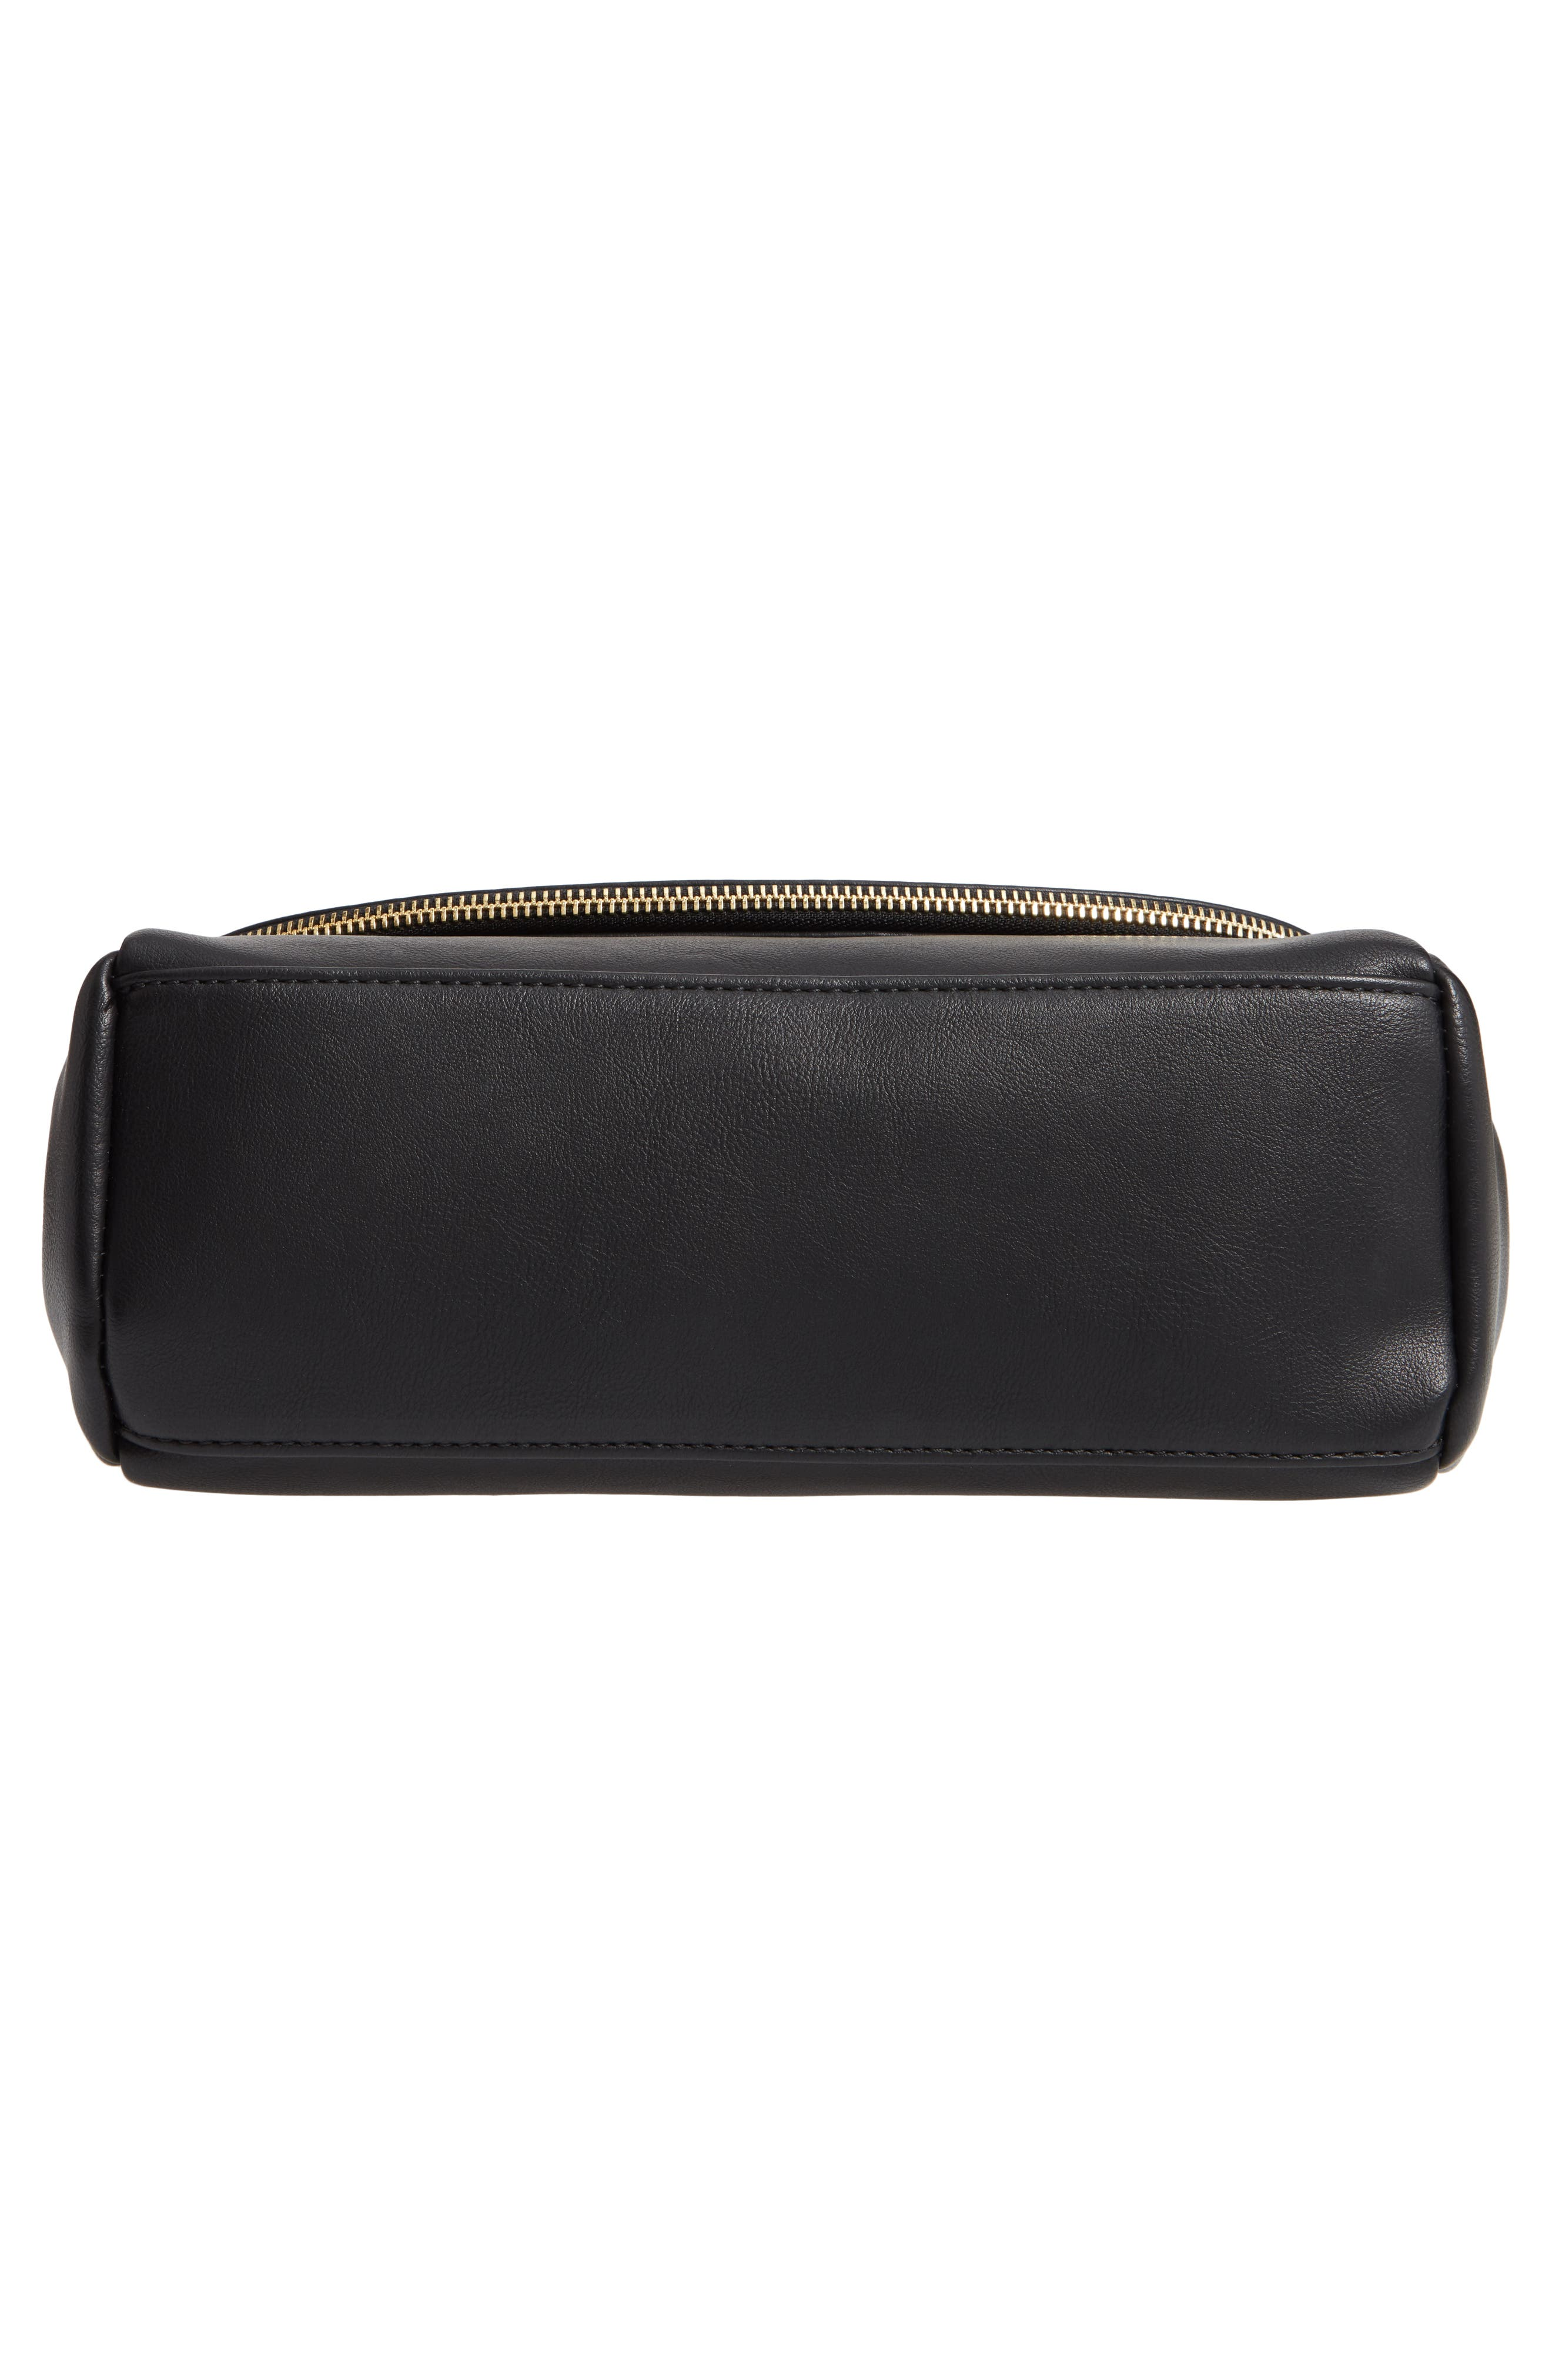 Rubie Faux Leather Crossbody Bag,                             Alternate thumbnail 6, color,                             BLACK